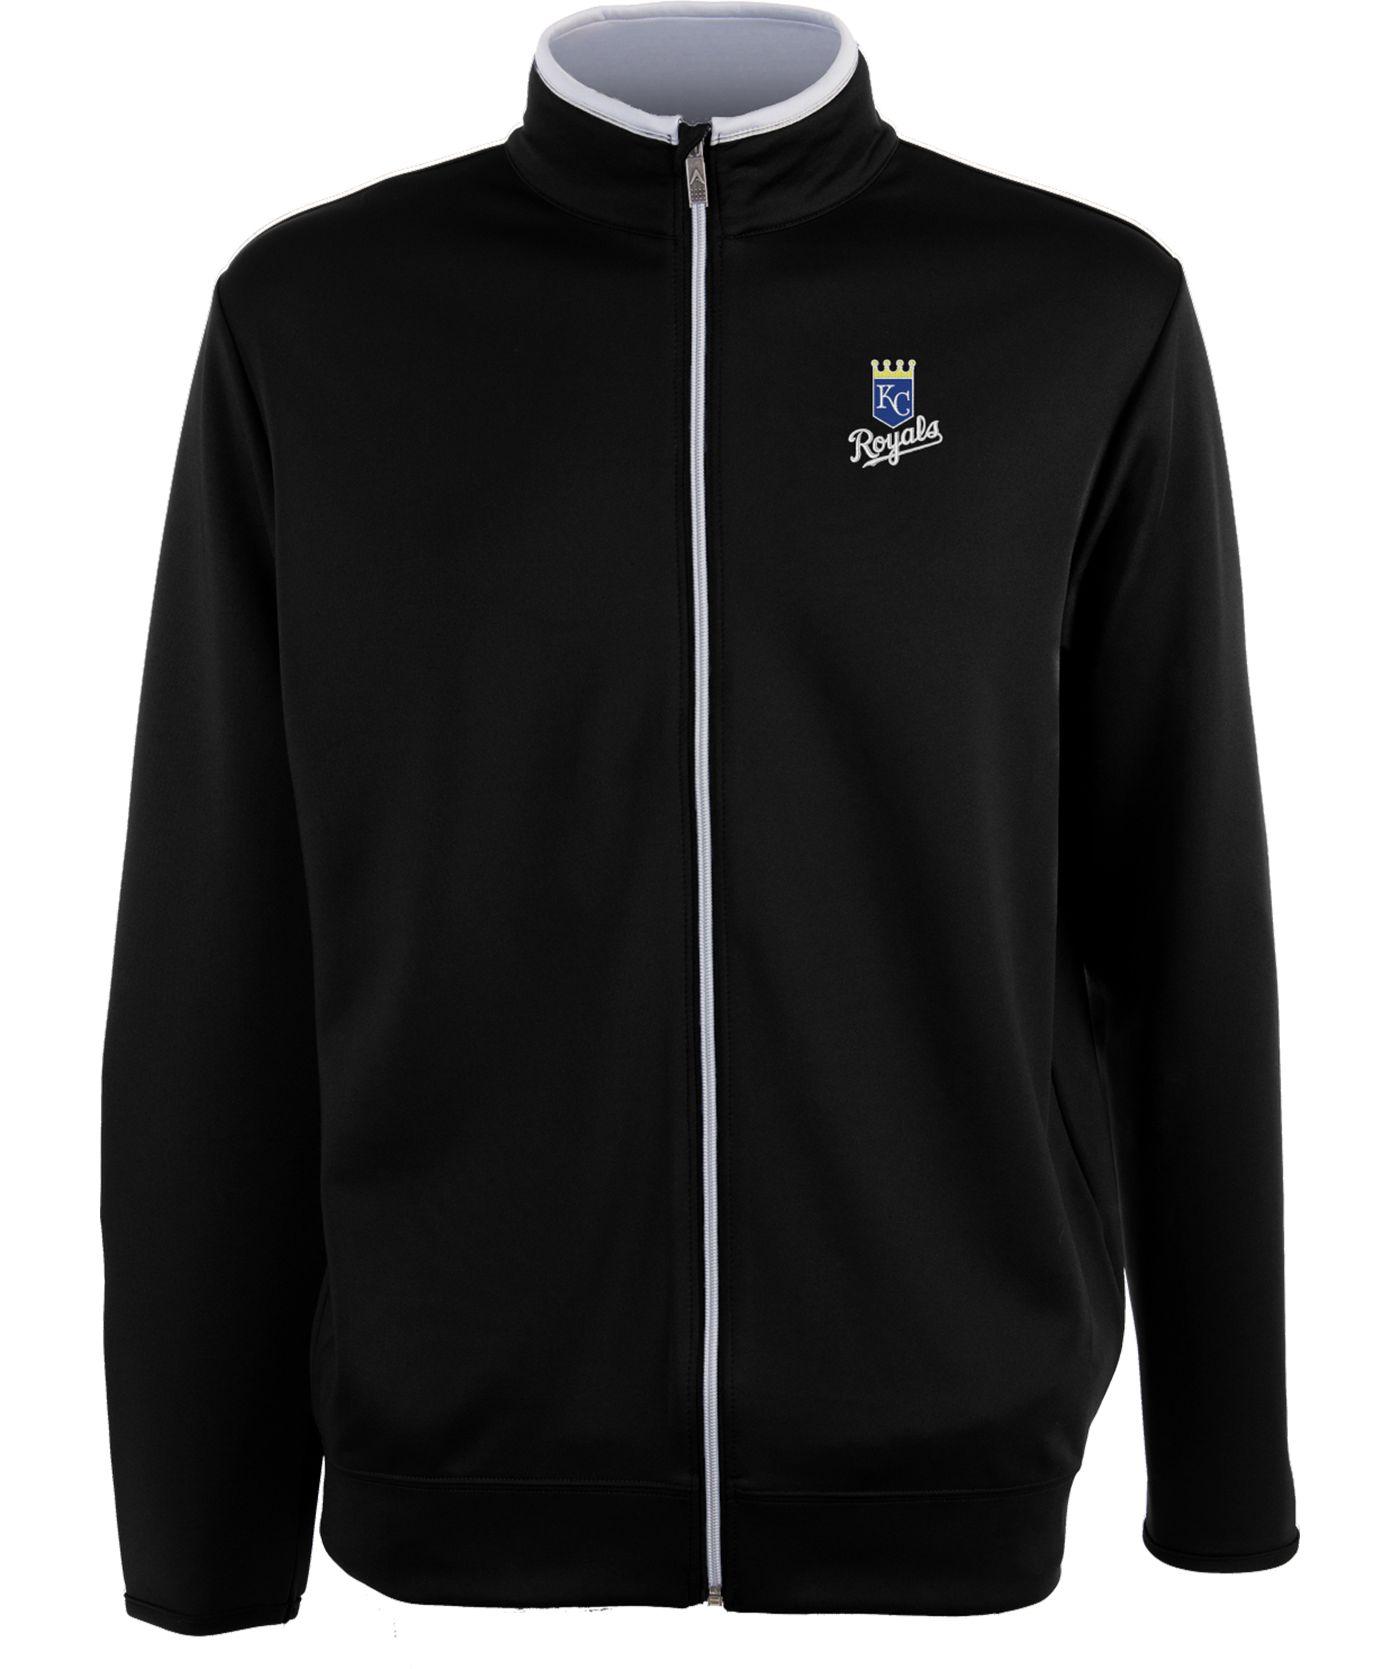 Antigua Men's Kansas City Royals Leader Black Full-Zip Jacket